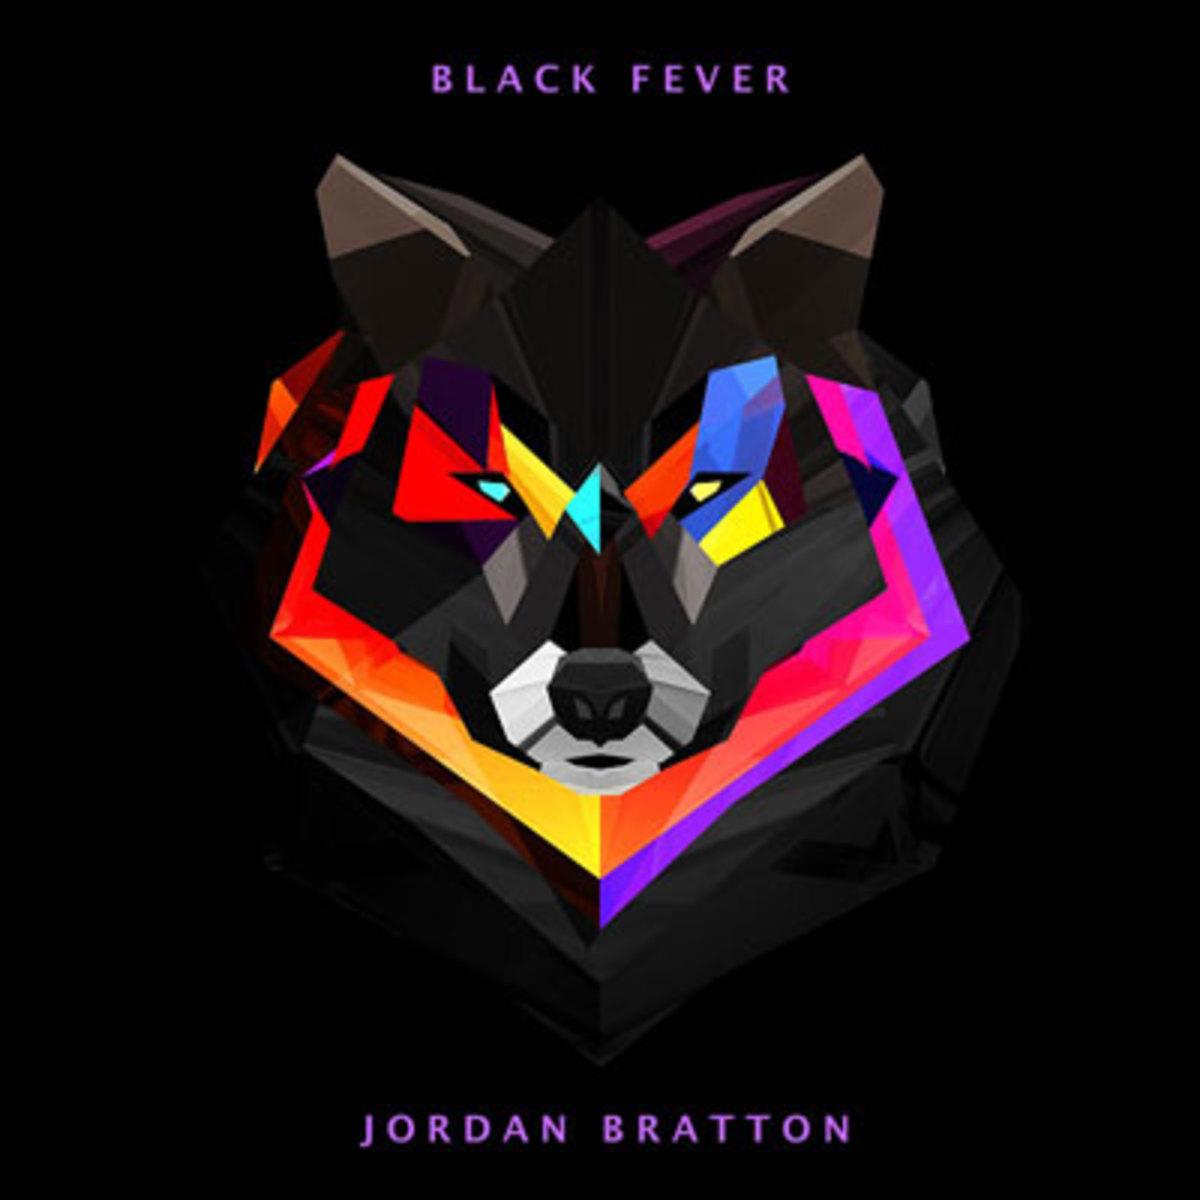 jordanbratton-blackfever.jpg